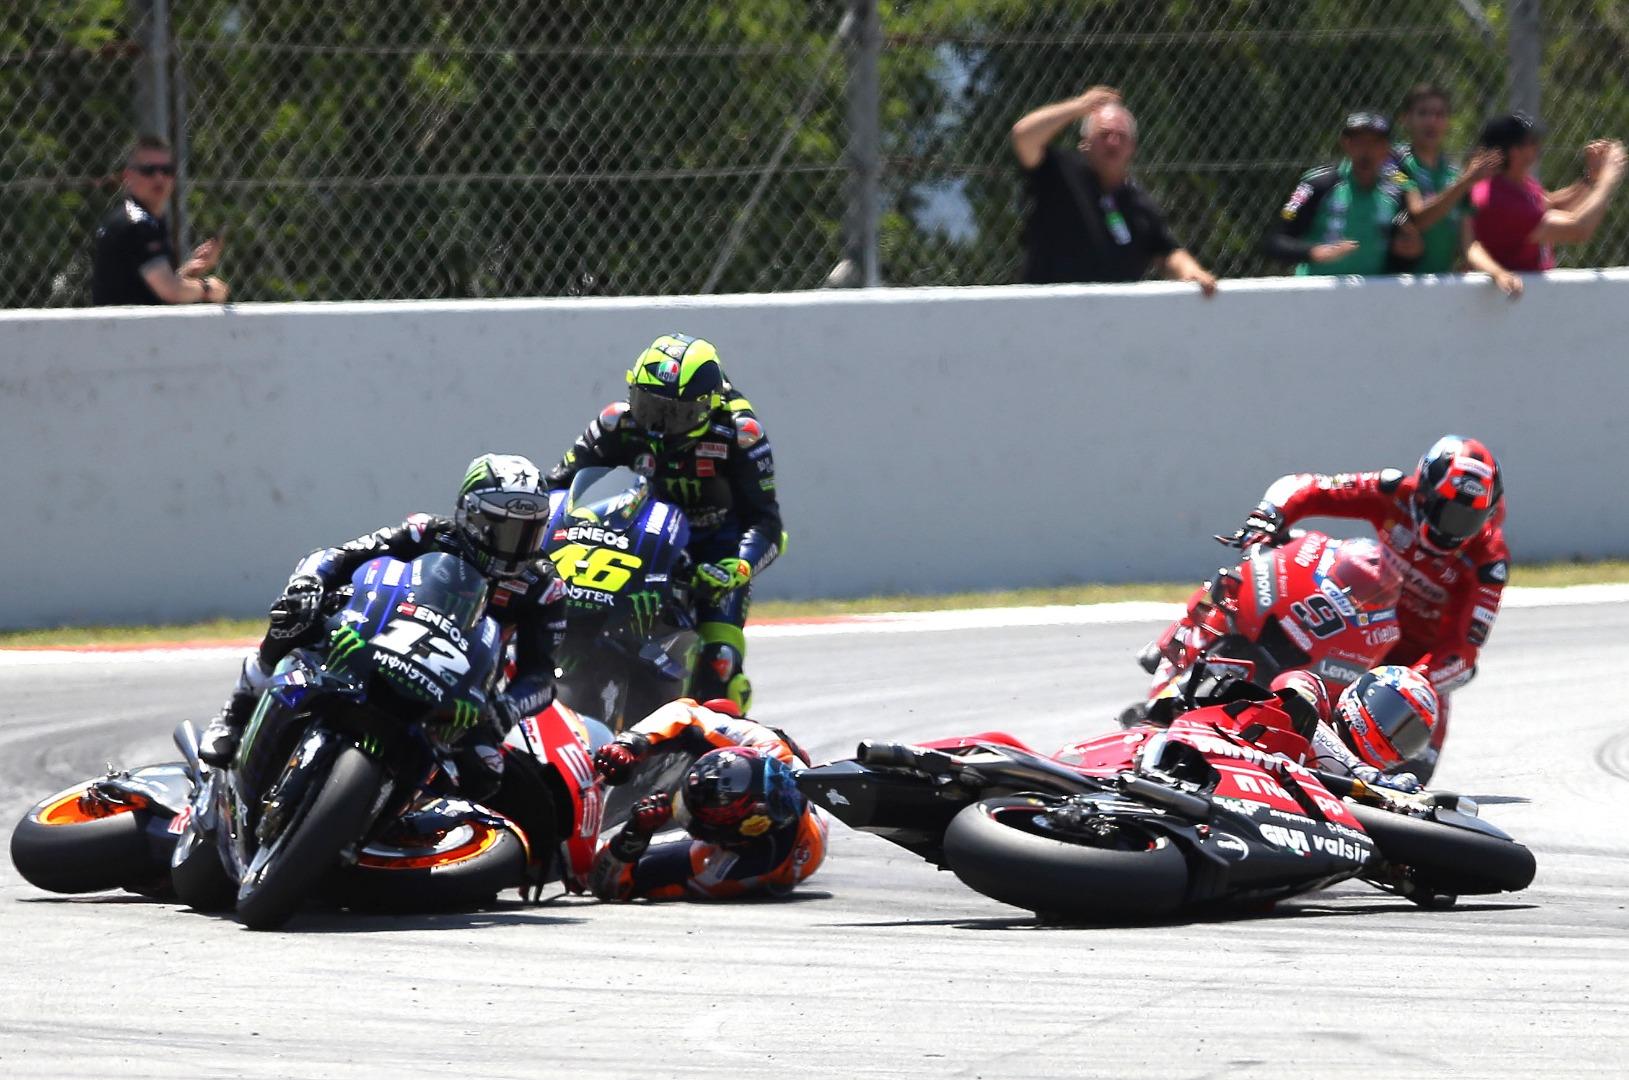 Incidente Jorge Lorenzo - MotoGP Catalunya 2019